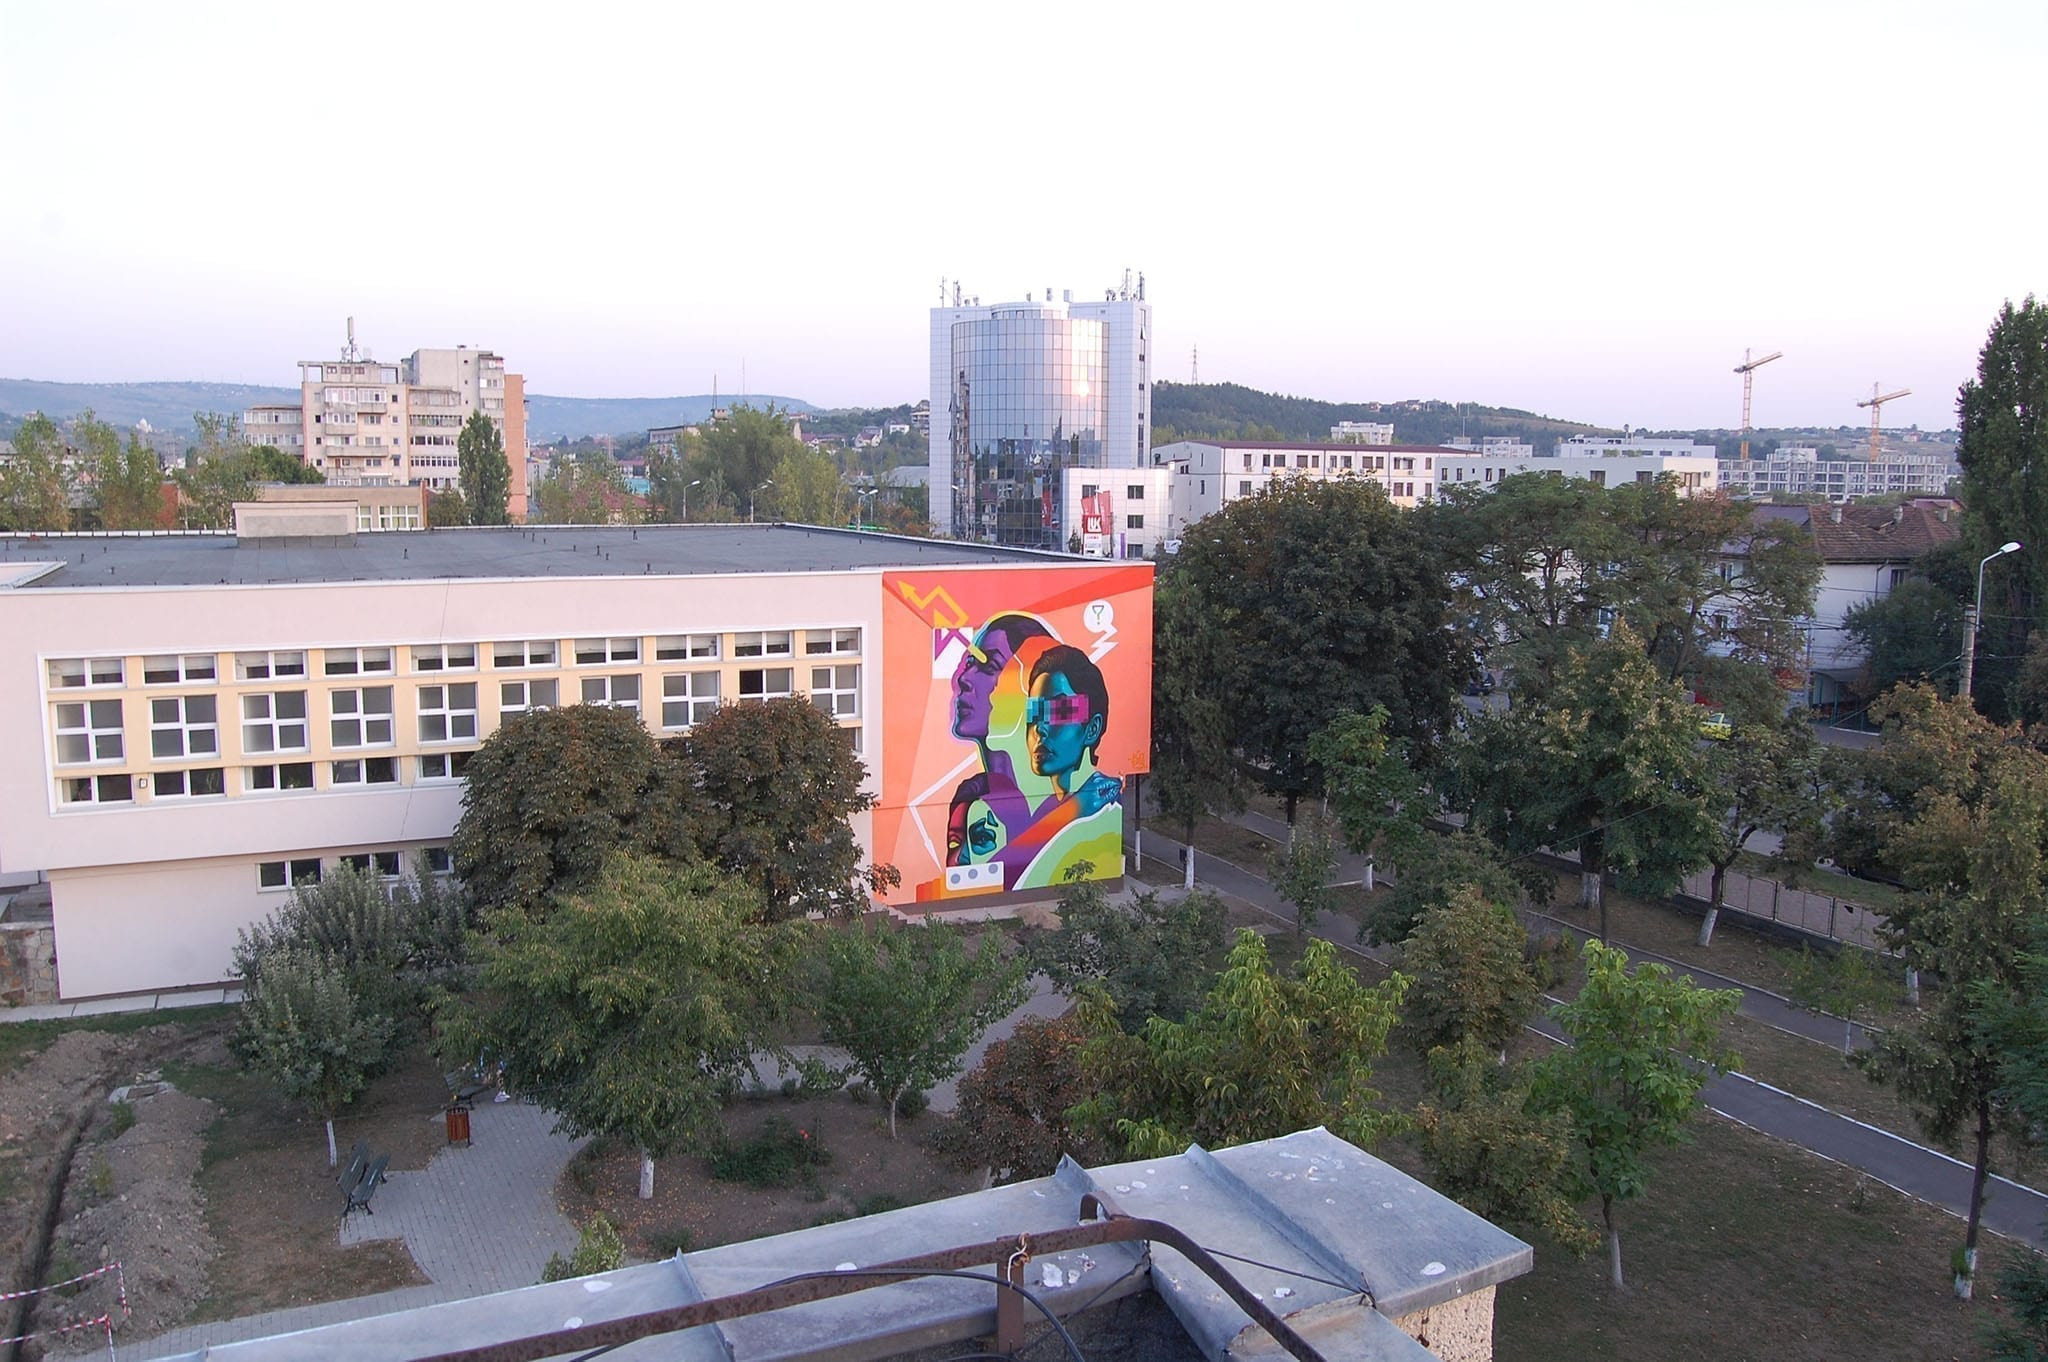 2019 KAPS CREW - Colegiul Tehnic Ioan C. Stefanescu / Un-hidden street art in Romania book art files: IAȘI